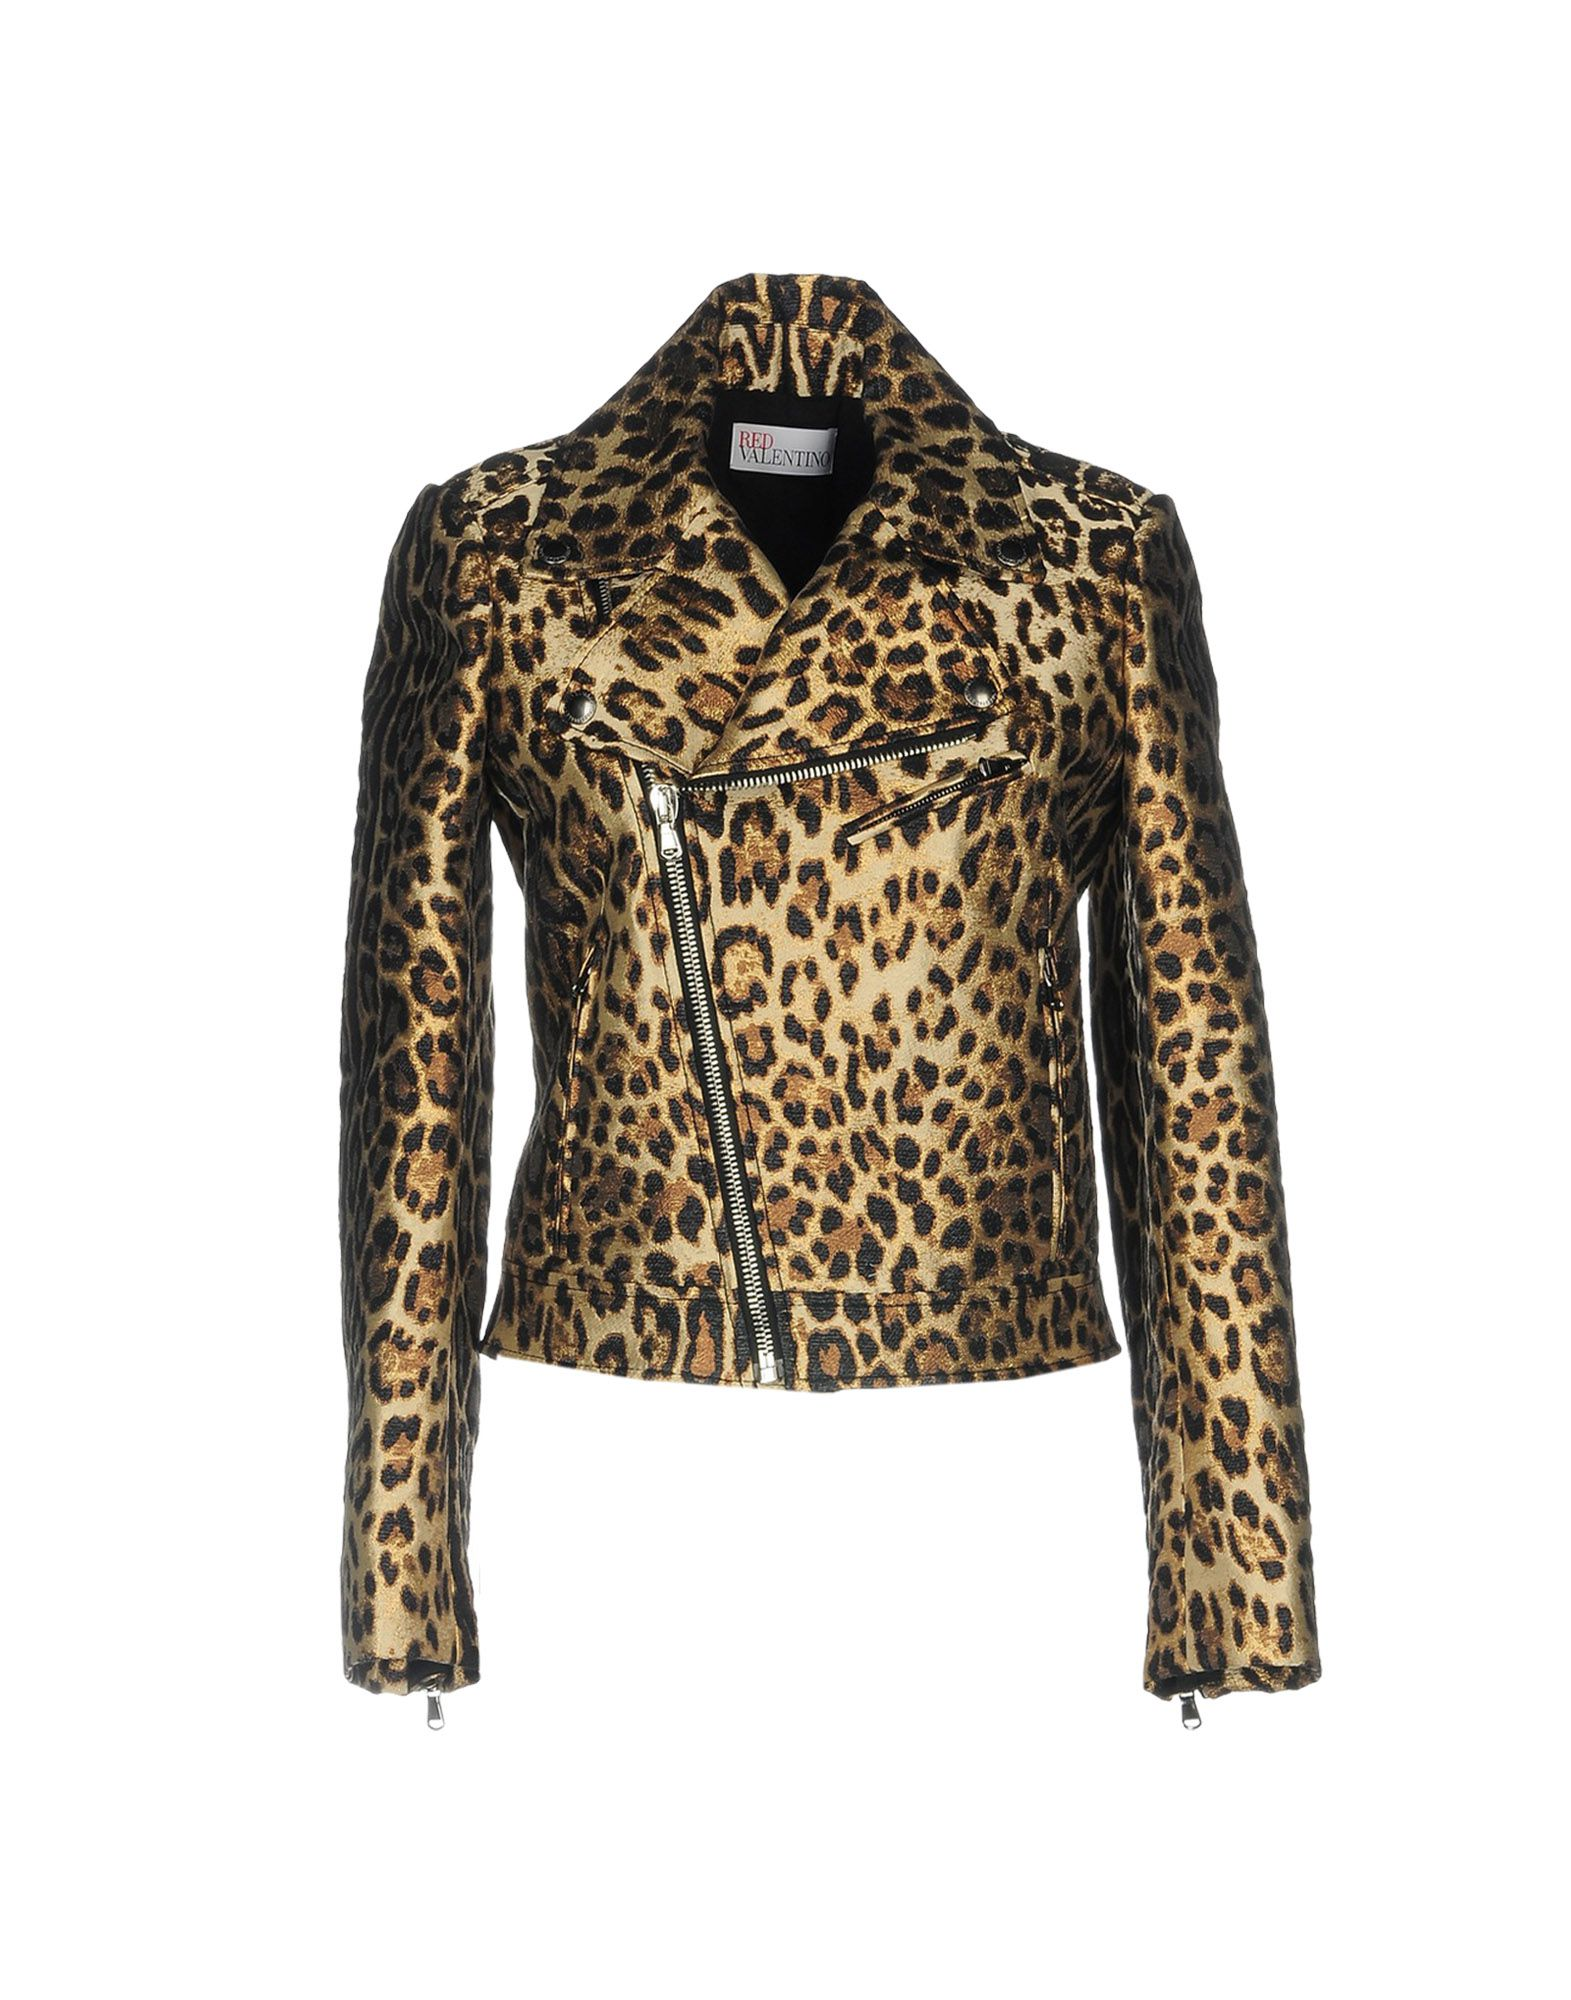 Outfit | REDValentino Damen Jacke Farbe Beige Größe 3